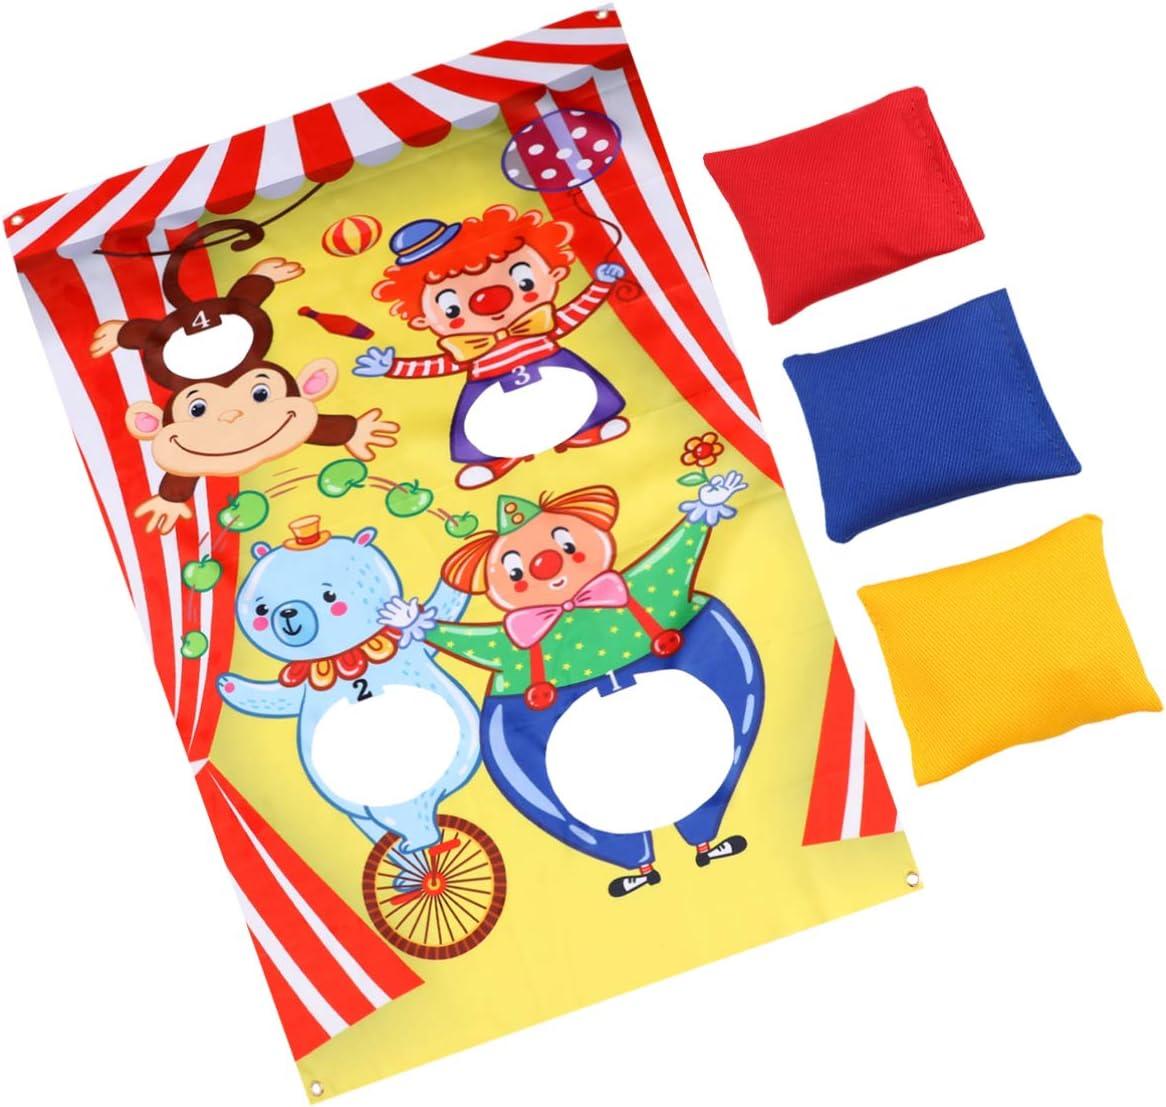 NUOBESTY Bean Bag Toss Game Sandbag trend rank Toy Kids Cornhole Board Purchase